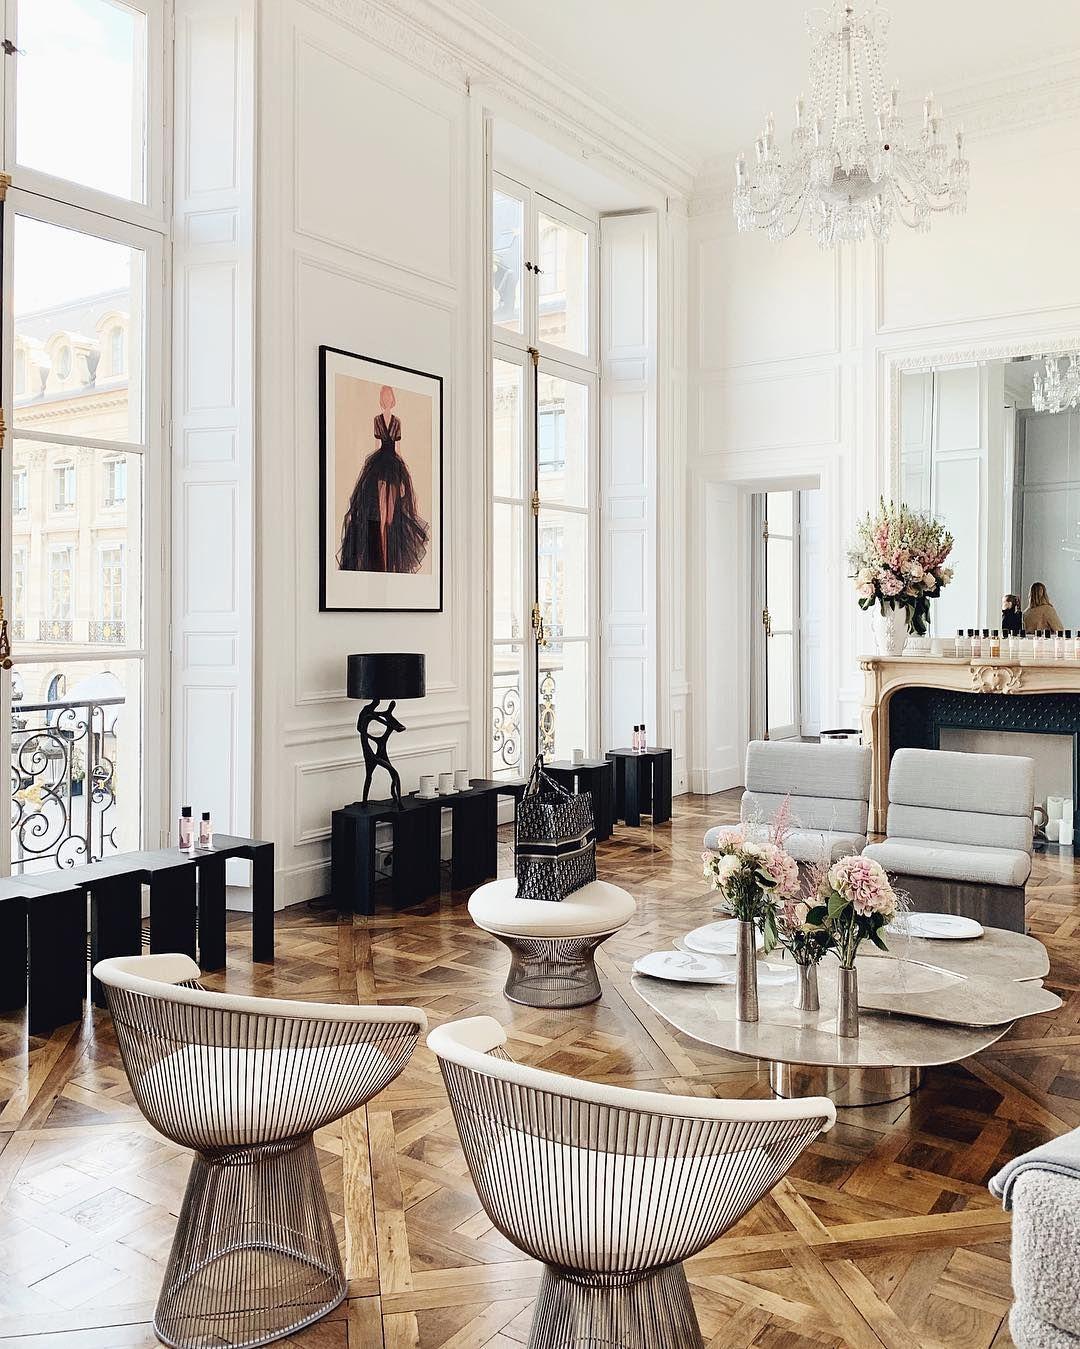 London Apartments Exterior: Maison Christian Dior Via @parisinfourmonths #carinolsson